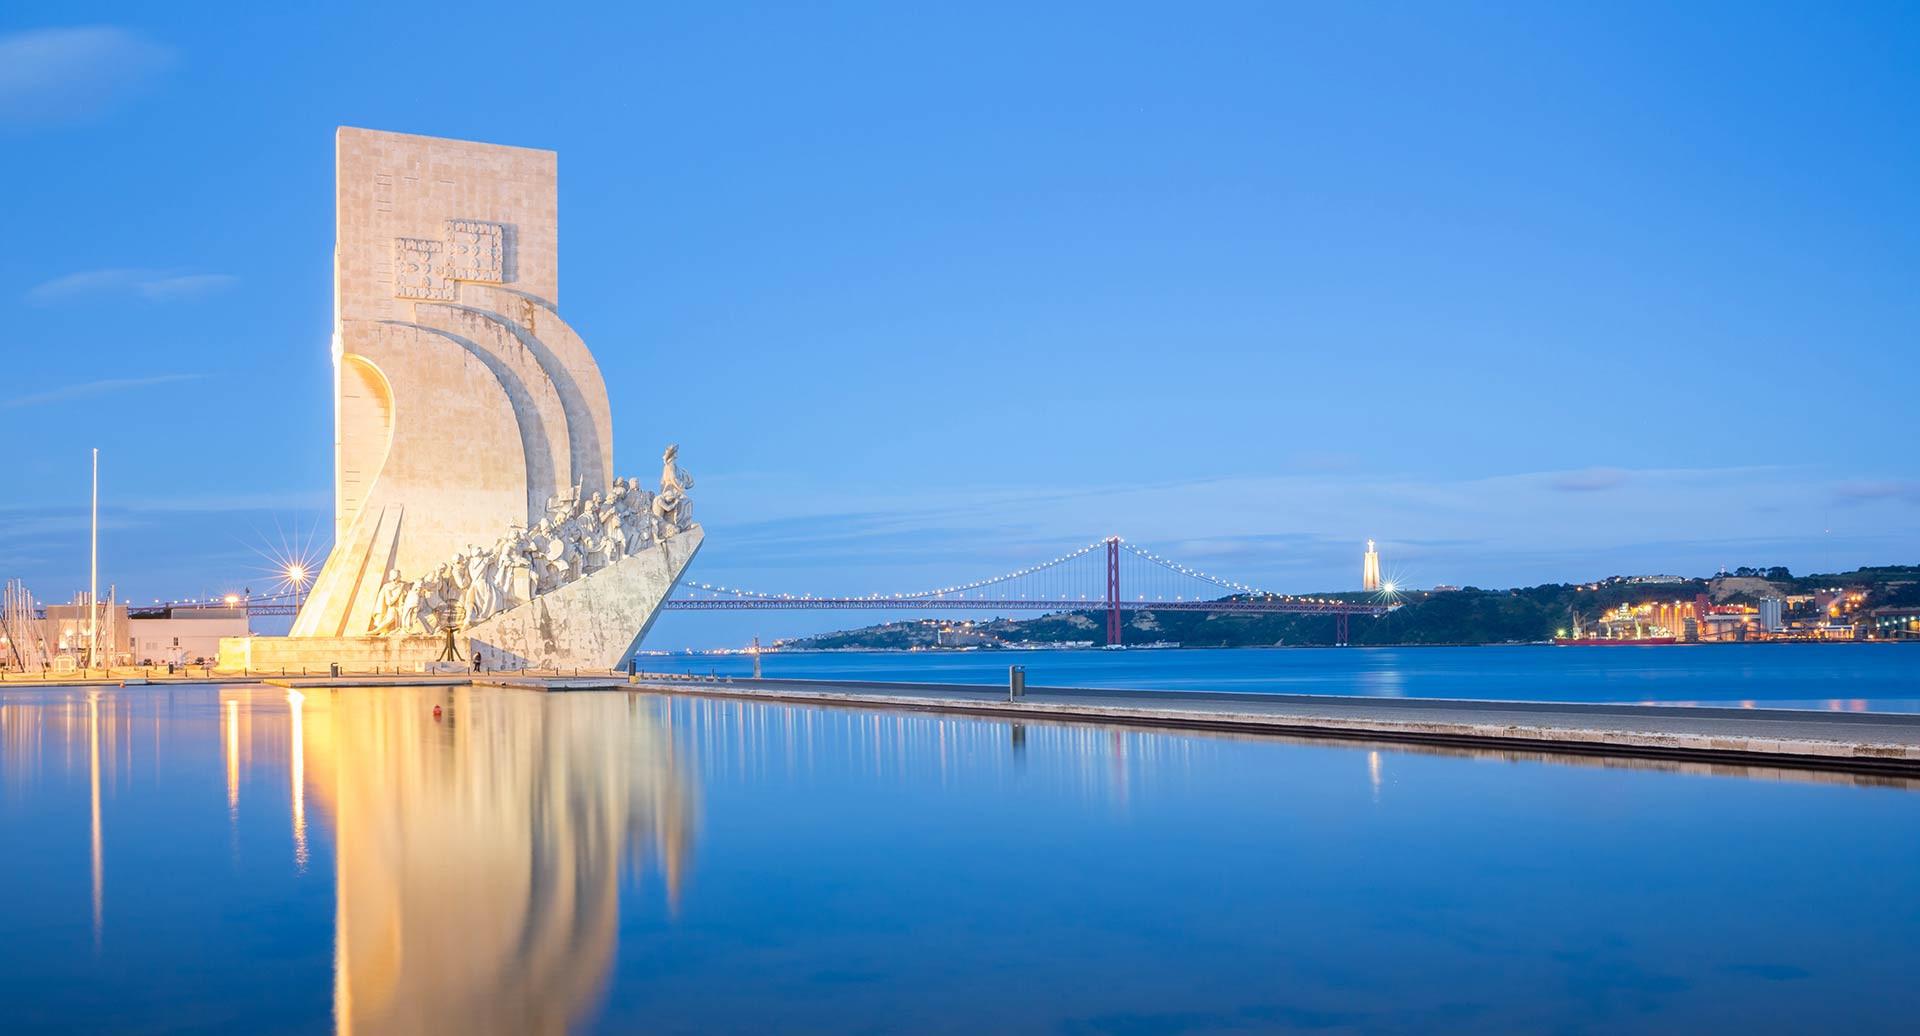 Bridge and Holy Christ Monument